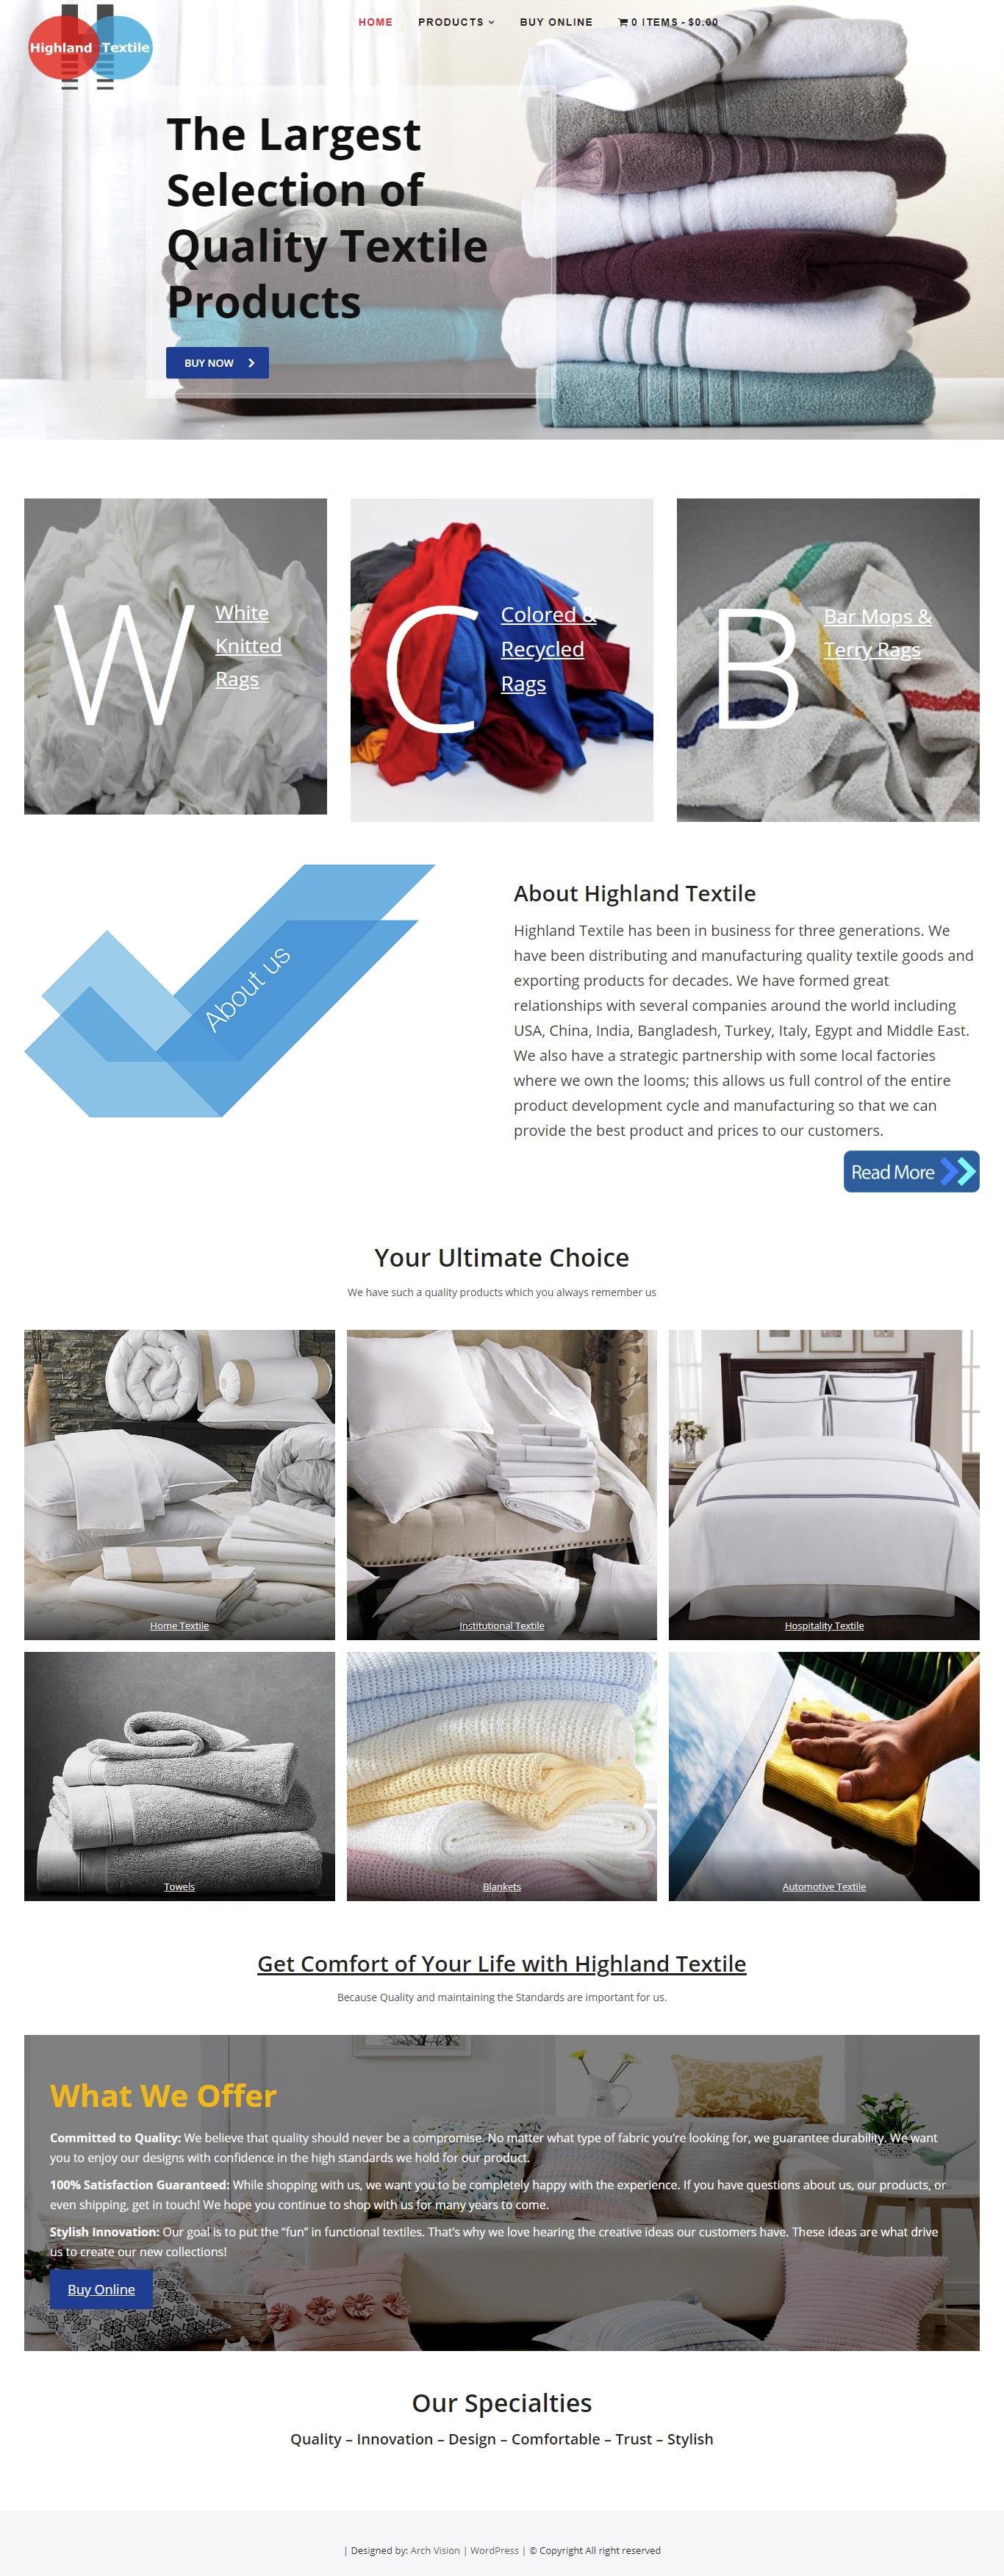 UASE based Textile Company Website…